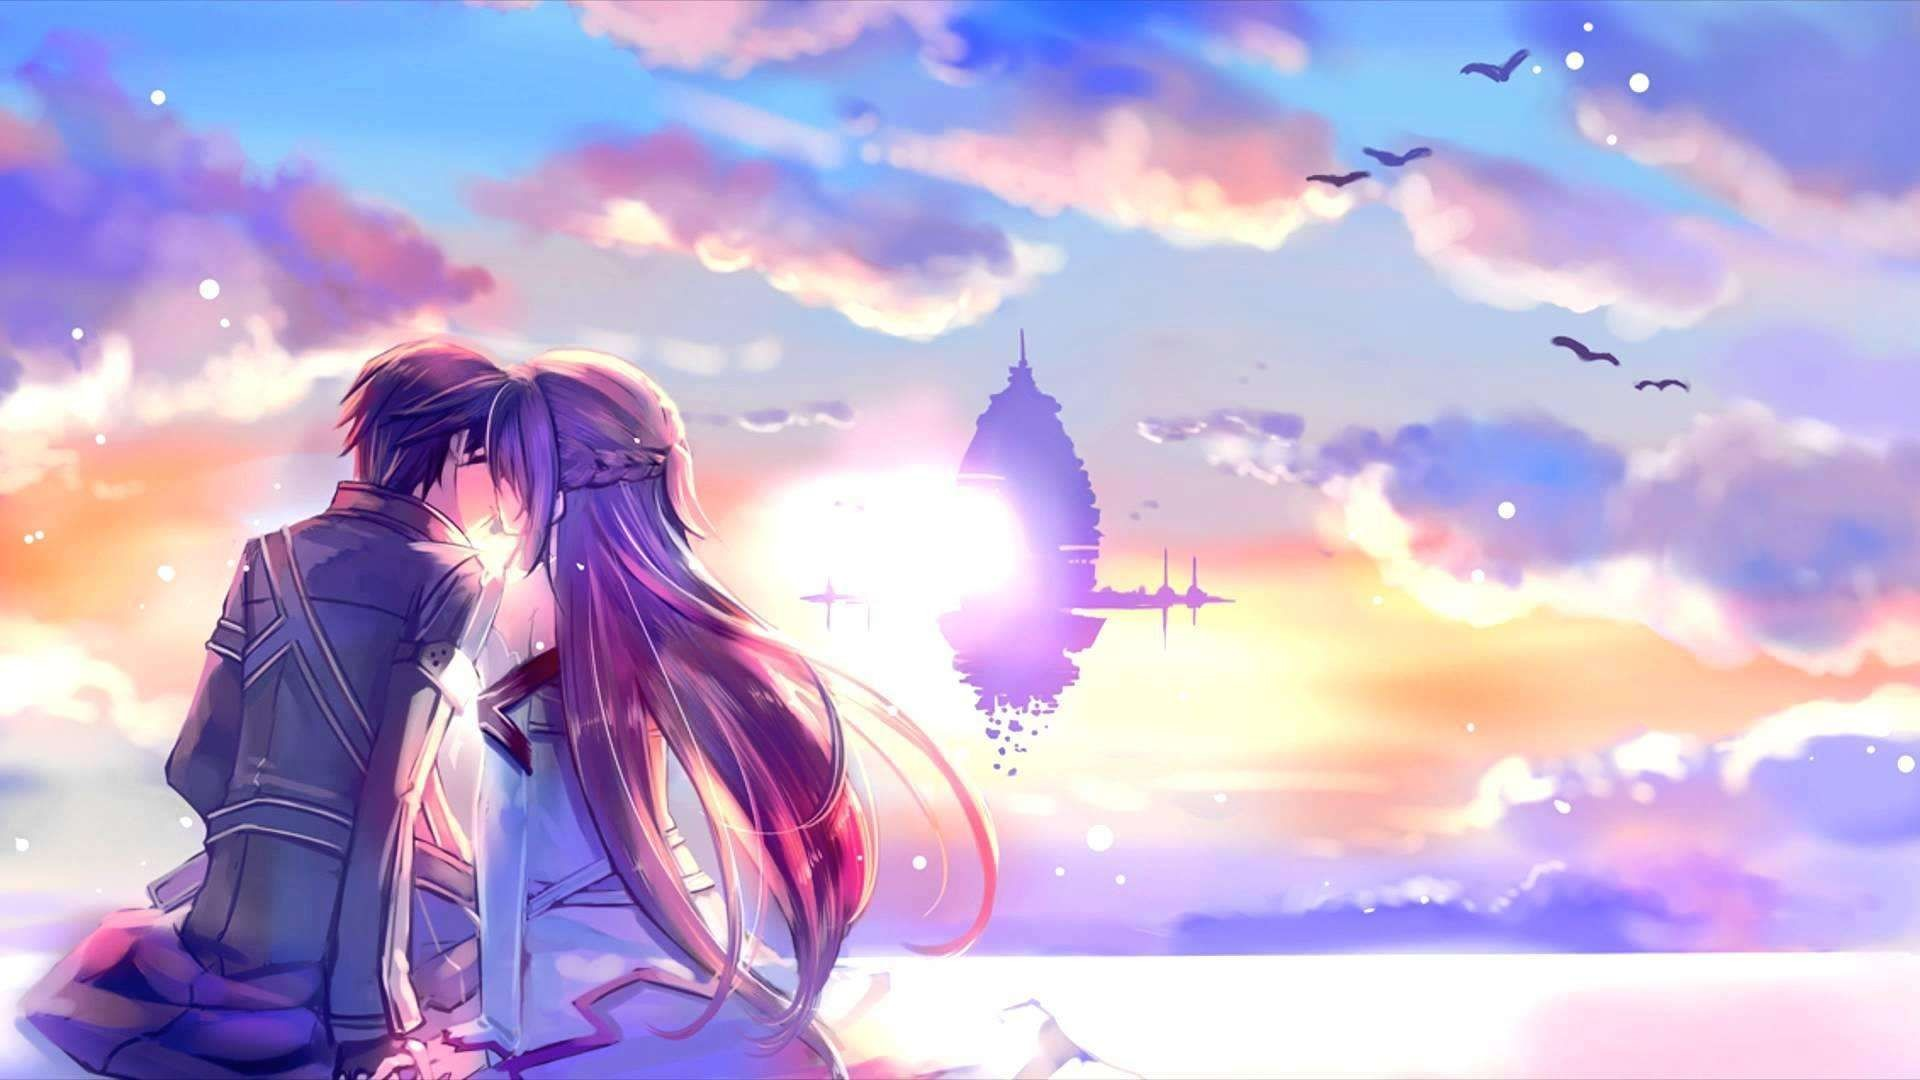 1920x1080, New Anime Love Wallpaper Hd 1080p At Hdwallwide - Love Wallpaper Anime - HD Wallpaper